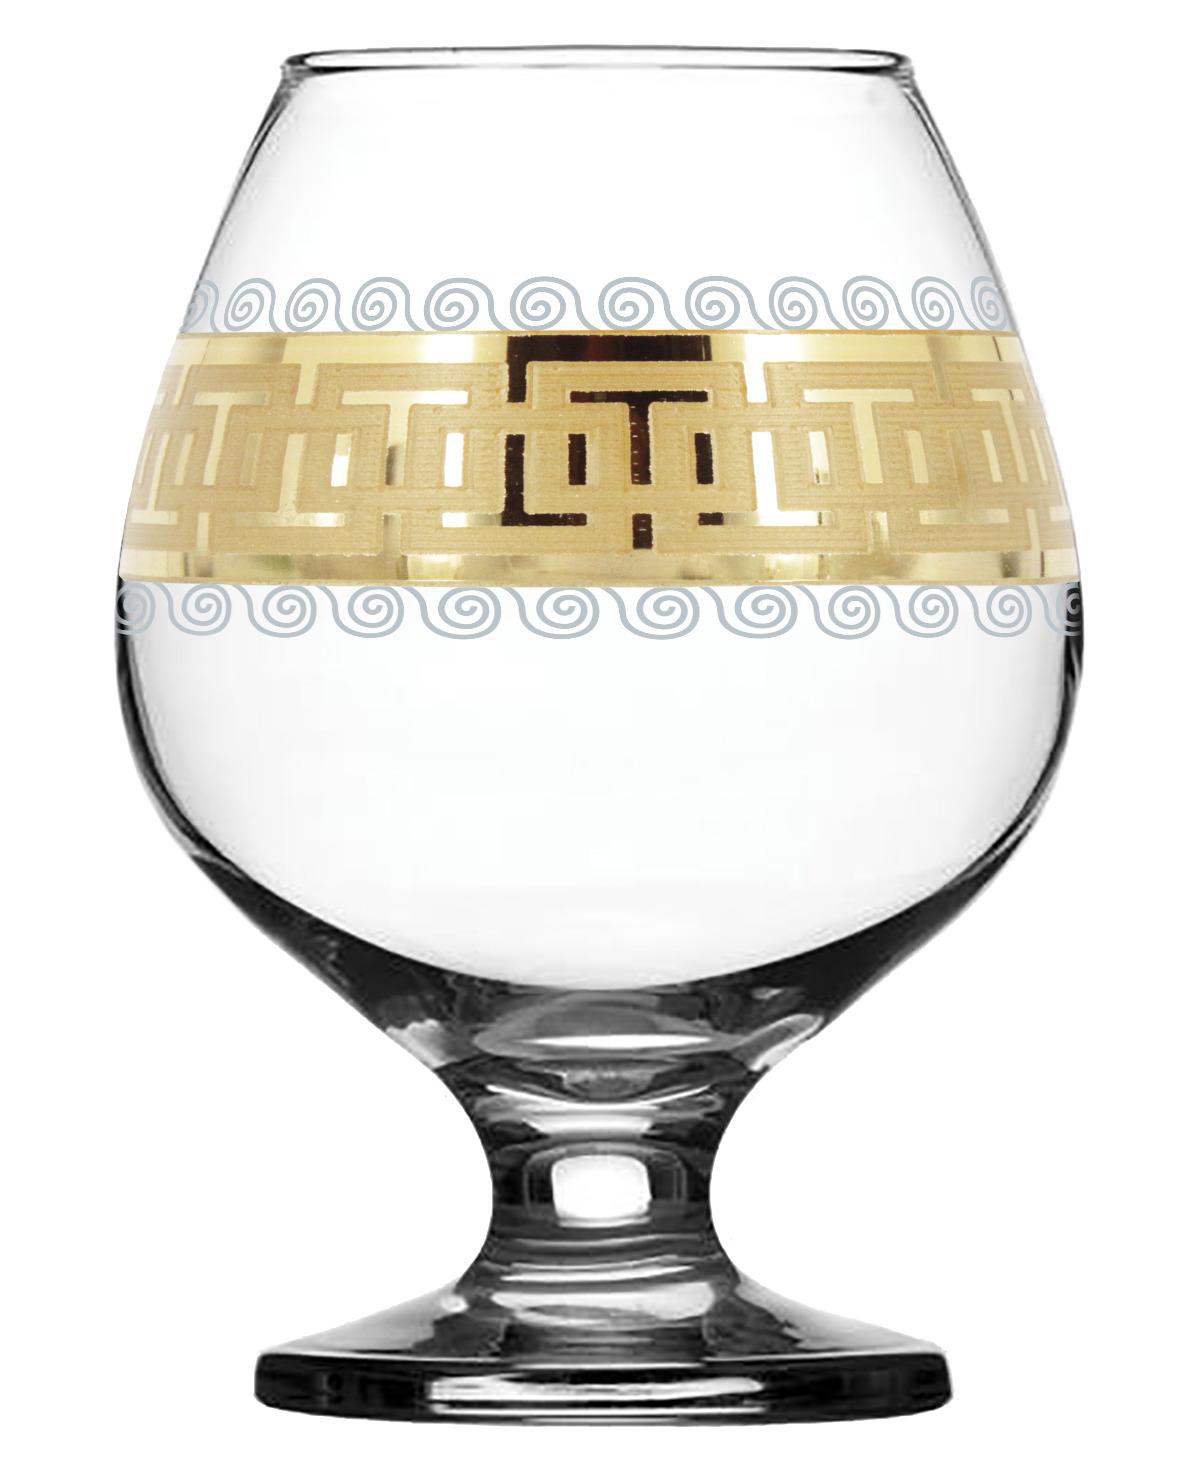 Набор бокалов для бренди Гусь-Хрустальный Меандр, EAV26-188, 400 мл, 6 шт набор бокалов гусь хрустальный золотой карат